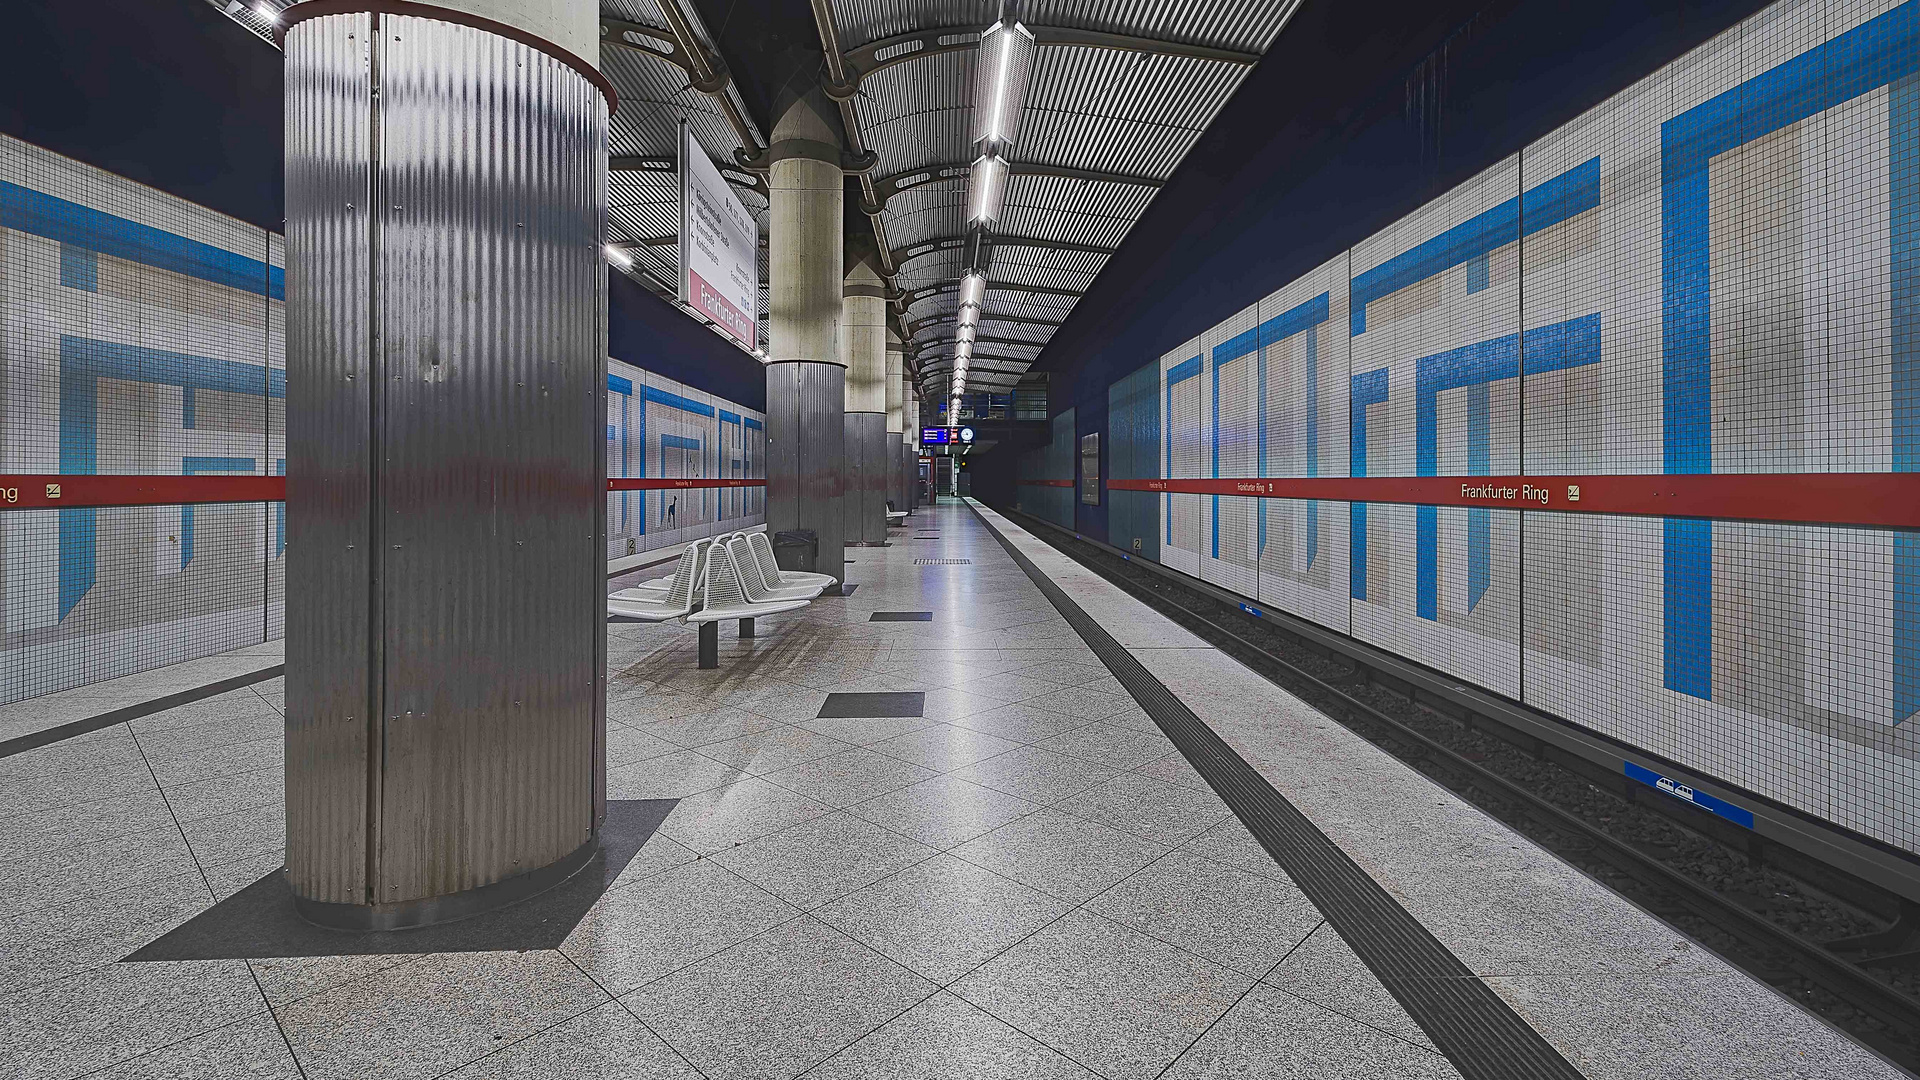 München, Linie U2, Station 'Frankfurter Ring'